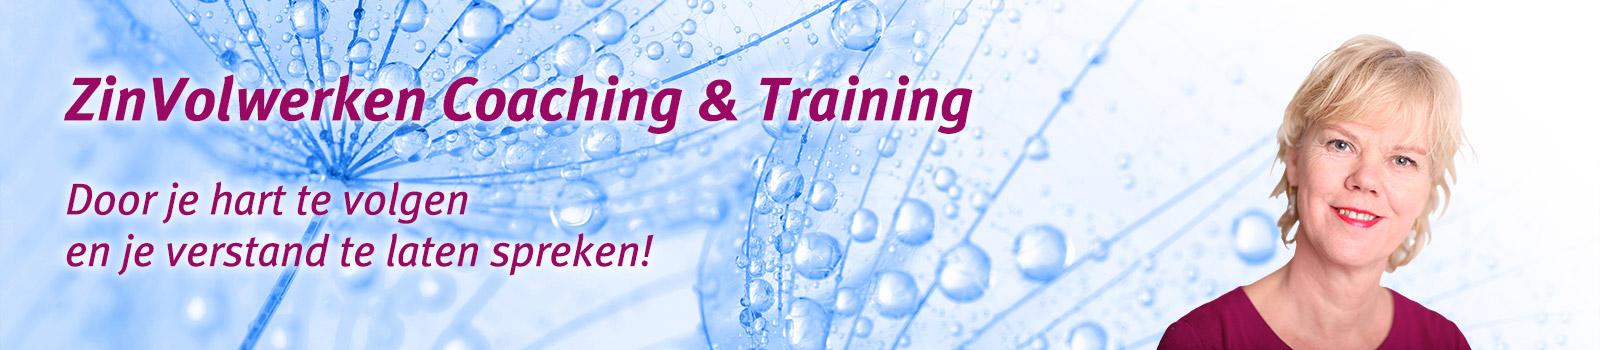 ZinVolwerken Coaching & Training